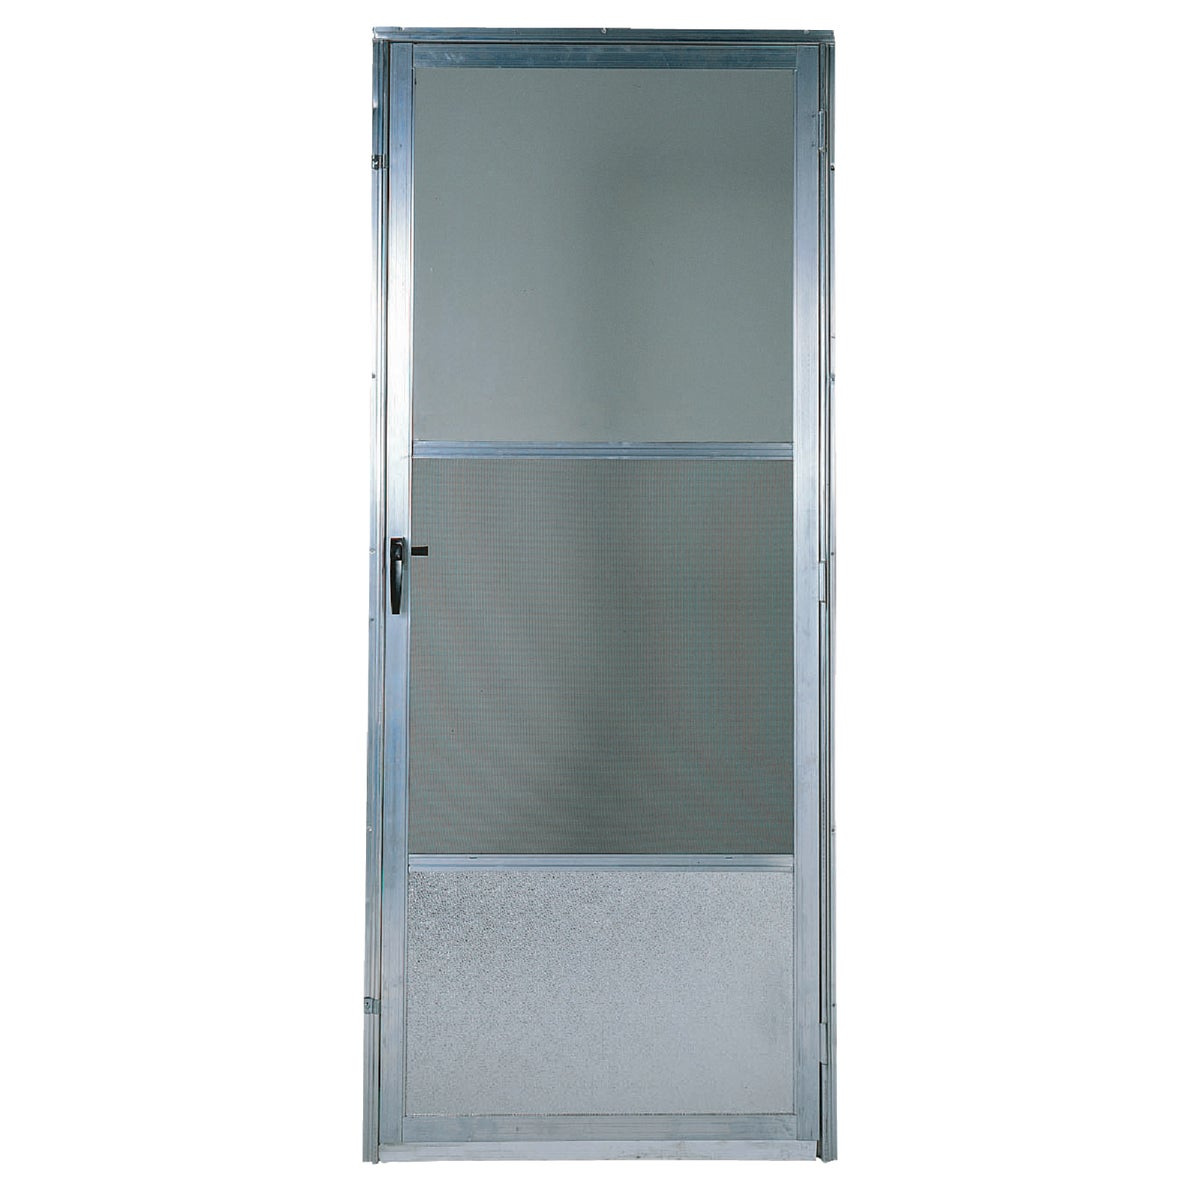 161 2868 Rh Mill Door